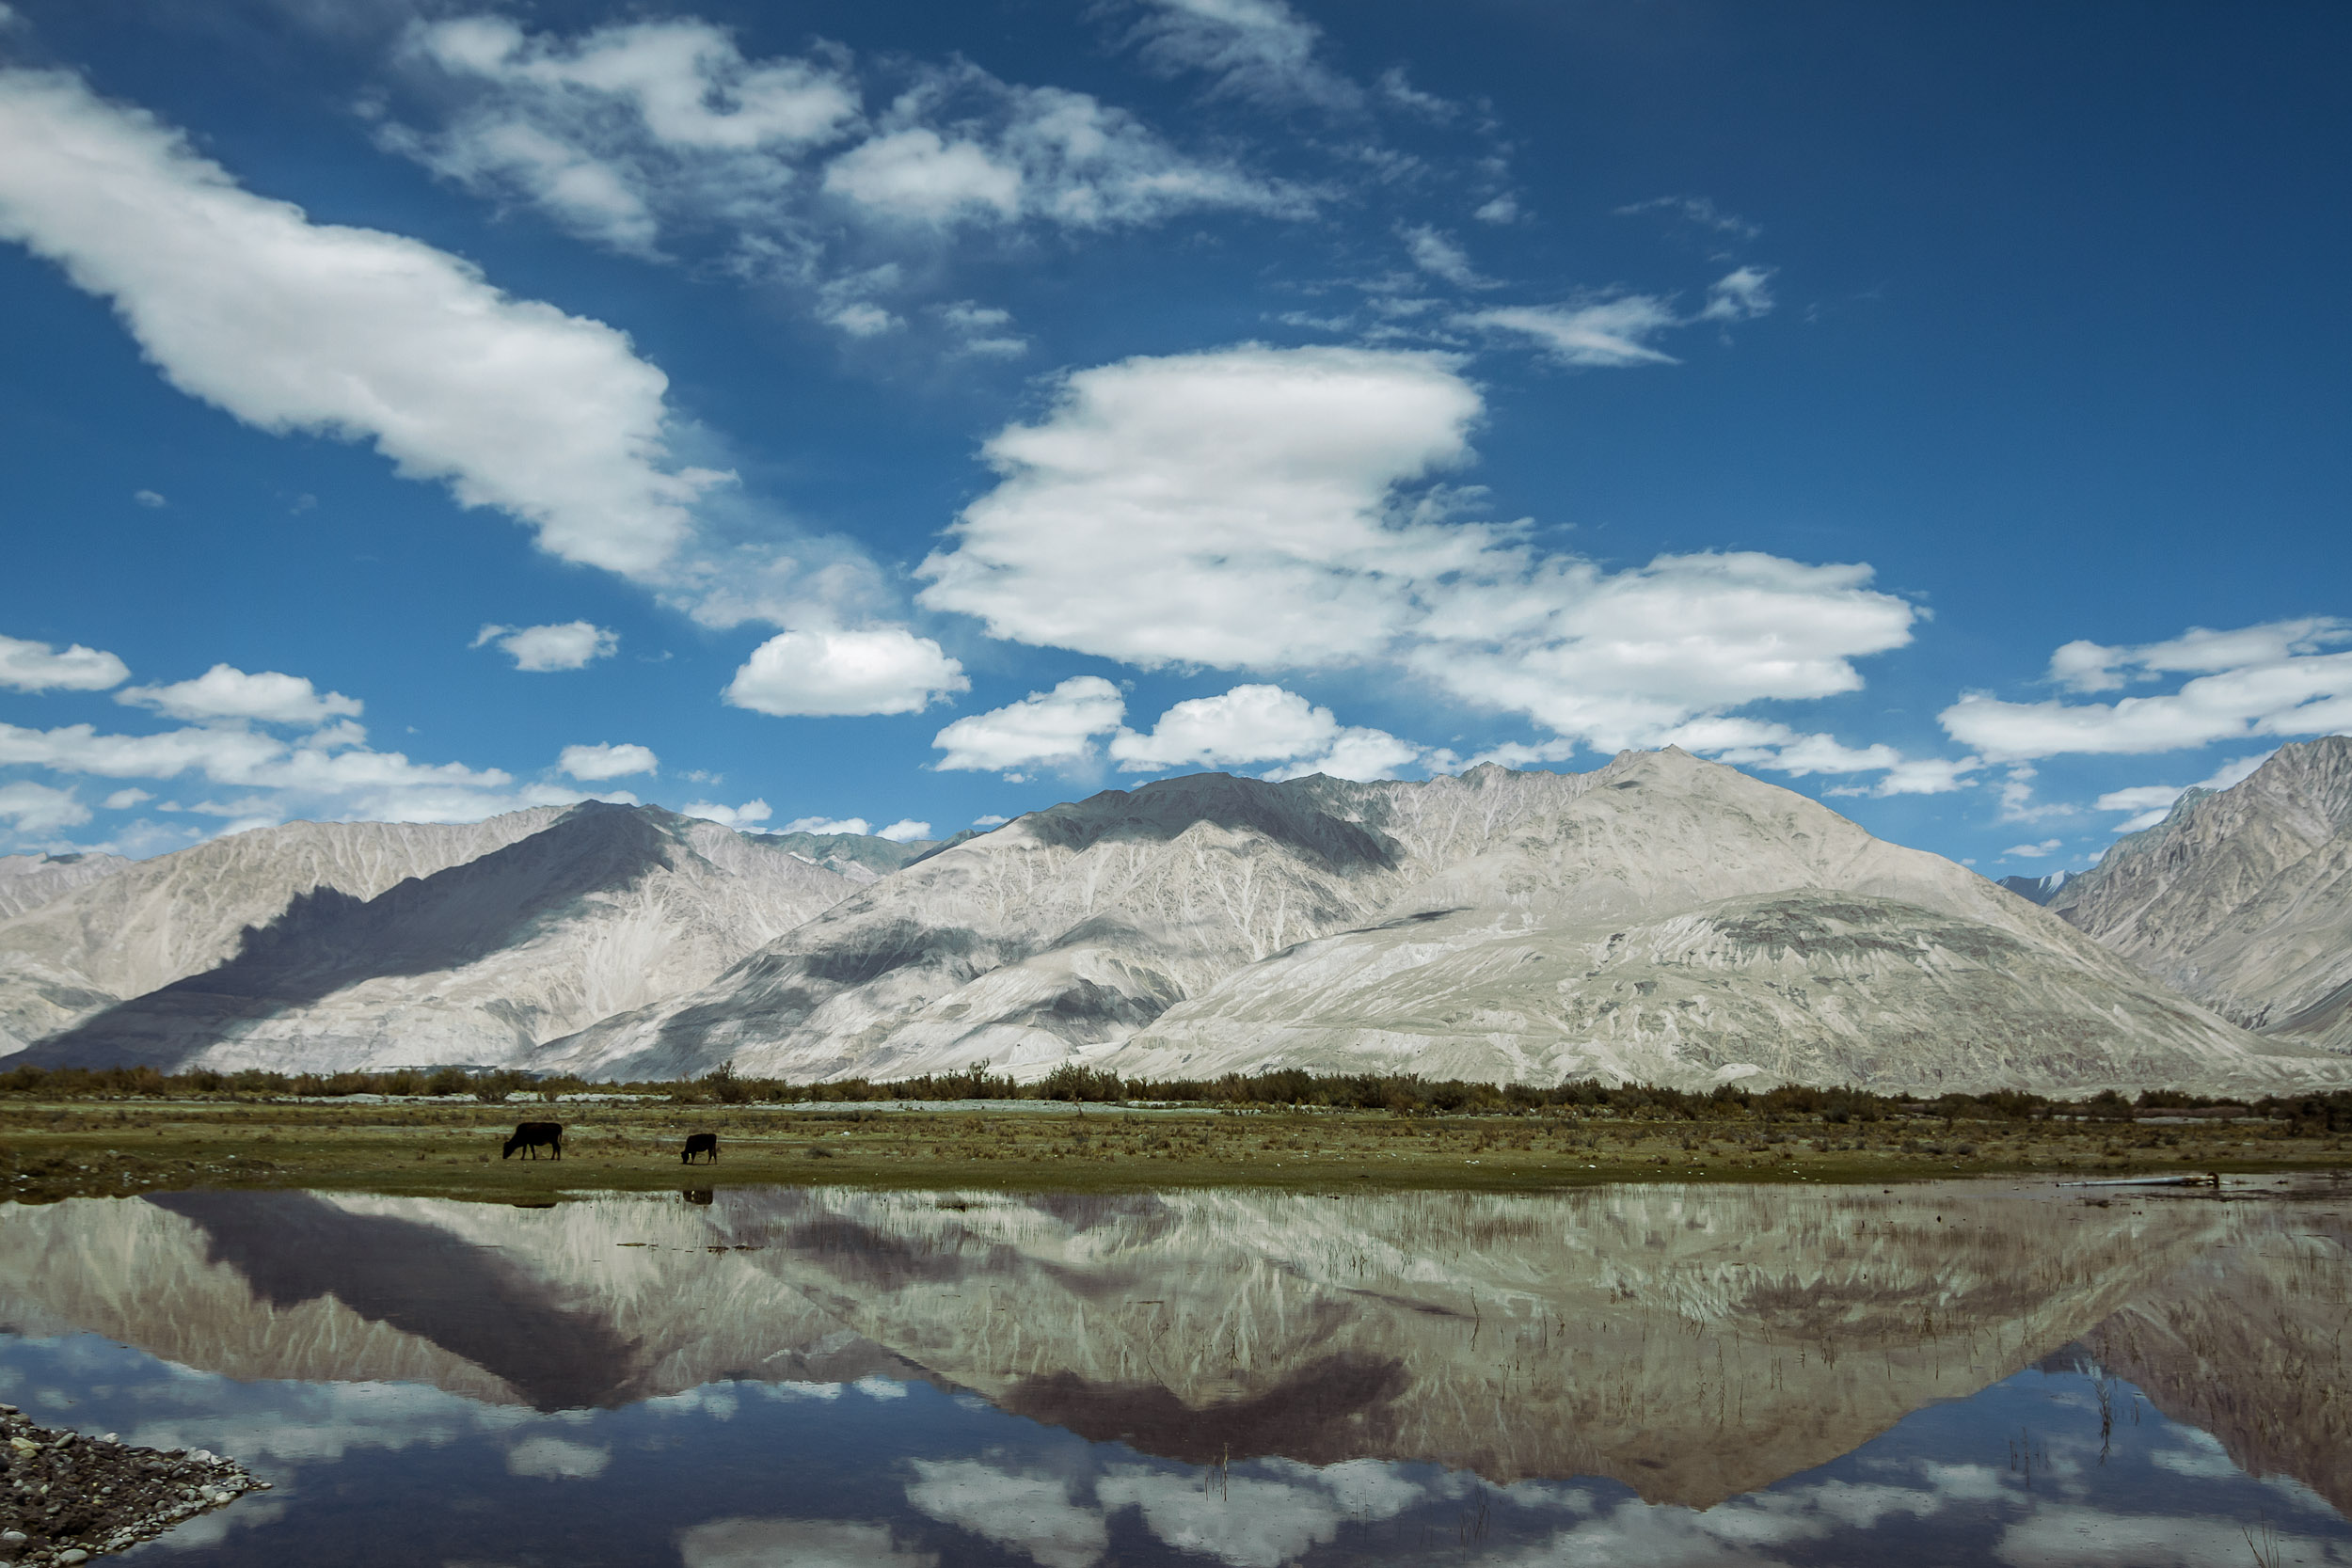 Sindhur_Photography_Travel_Landscape_Ladakh-21.JPG